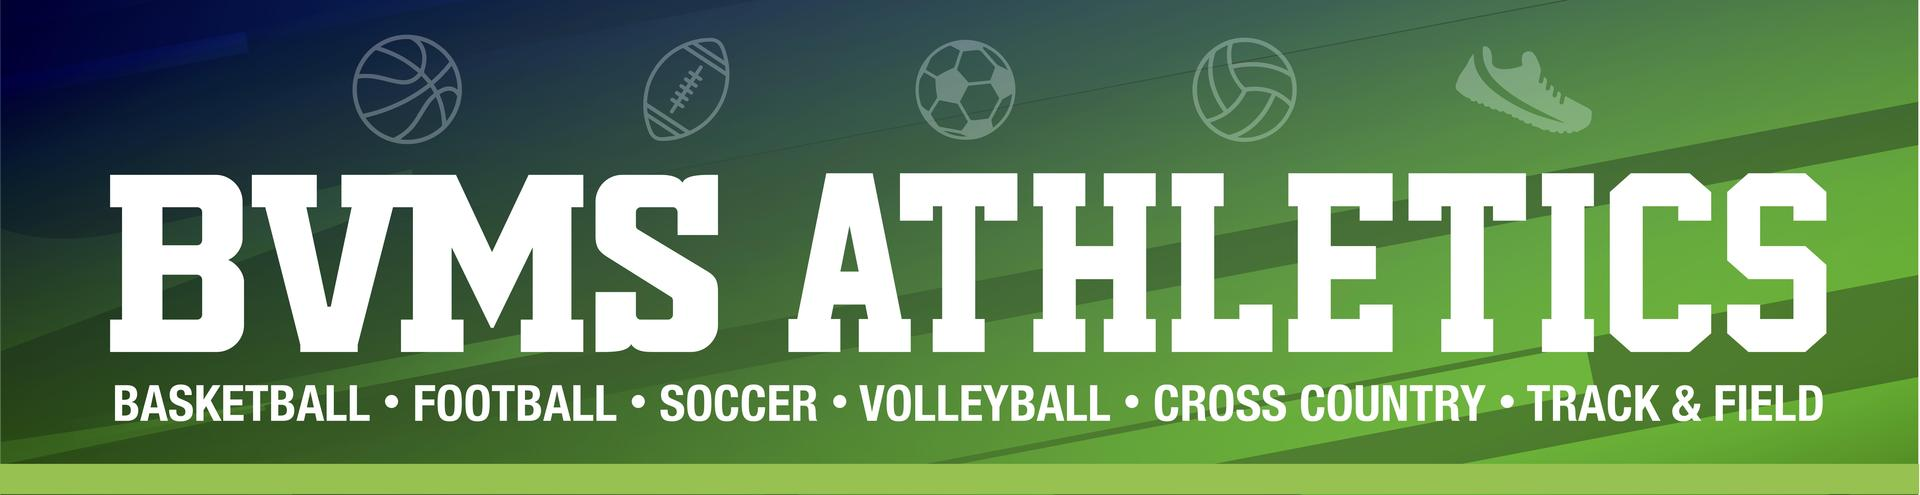 Athletics Banner